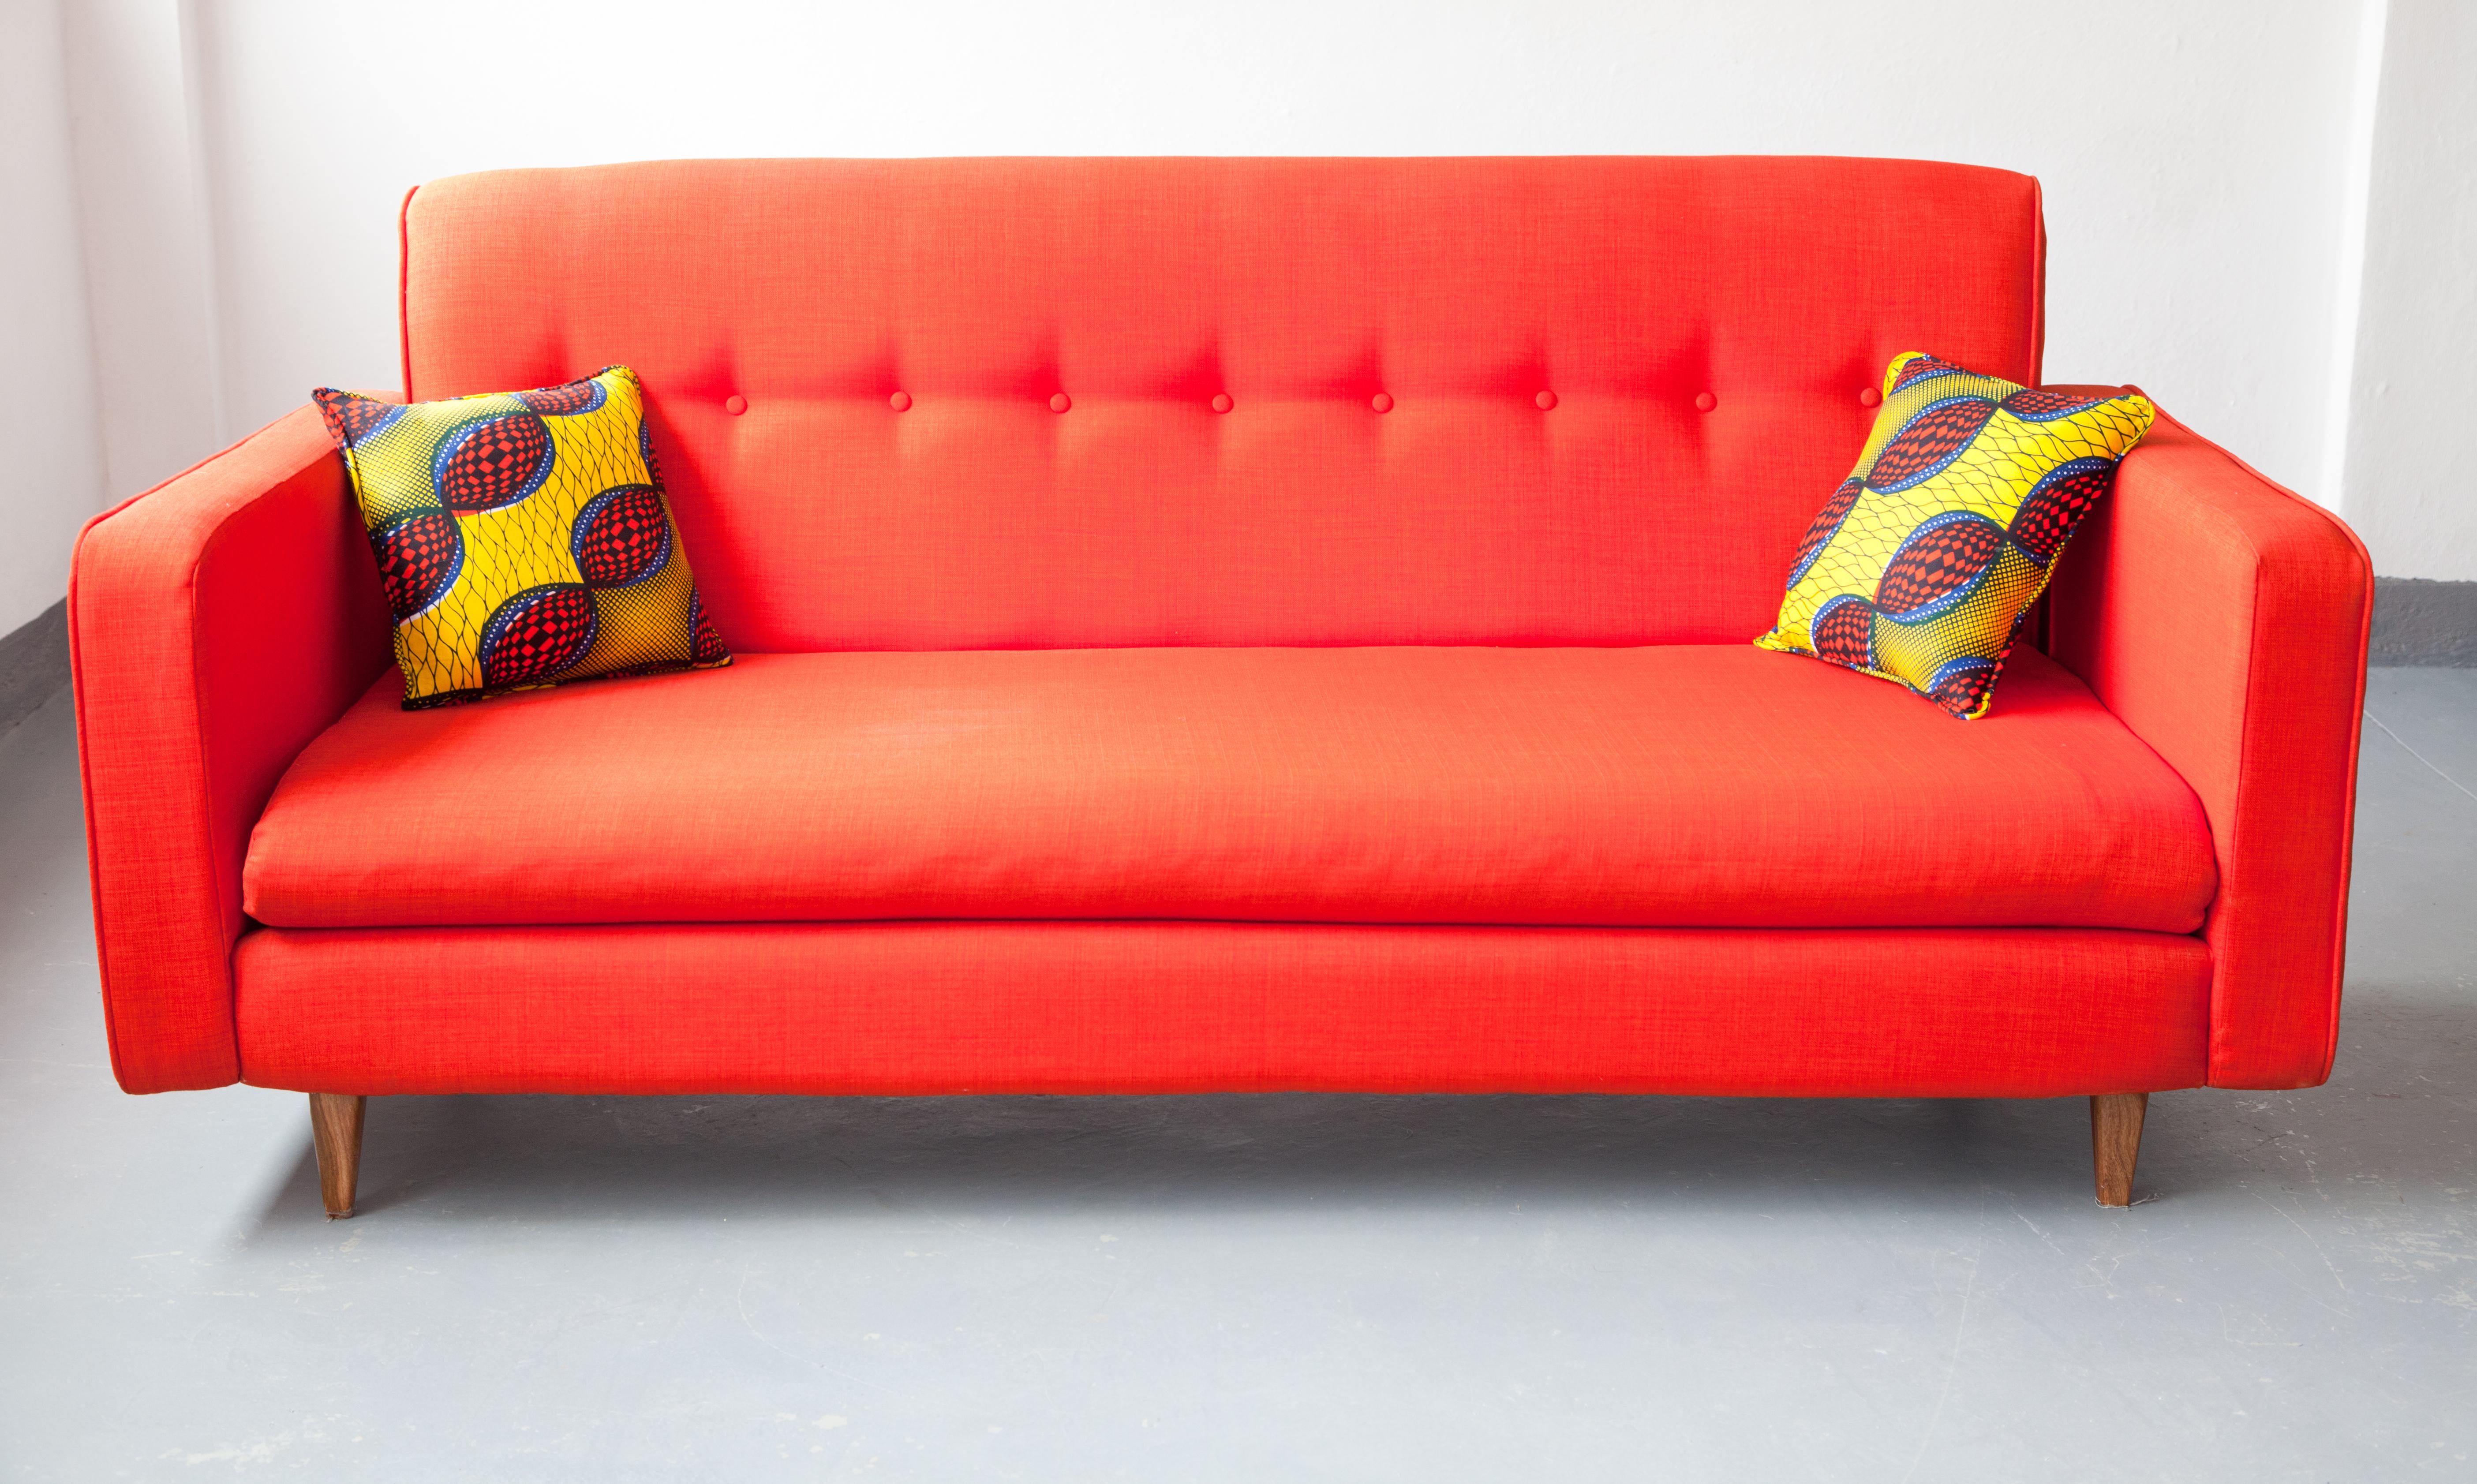 sofa_3seater_IMG_7462.jpg